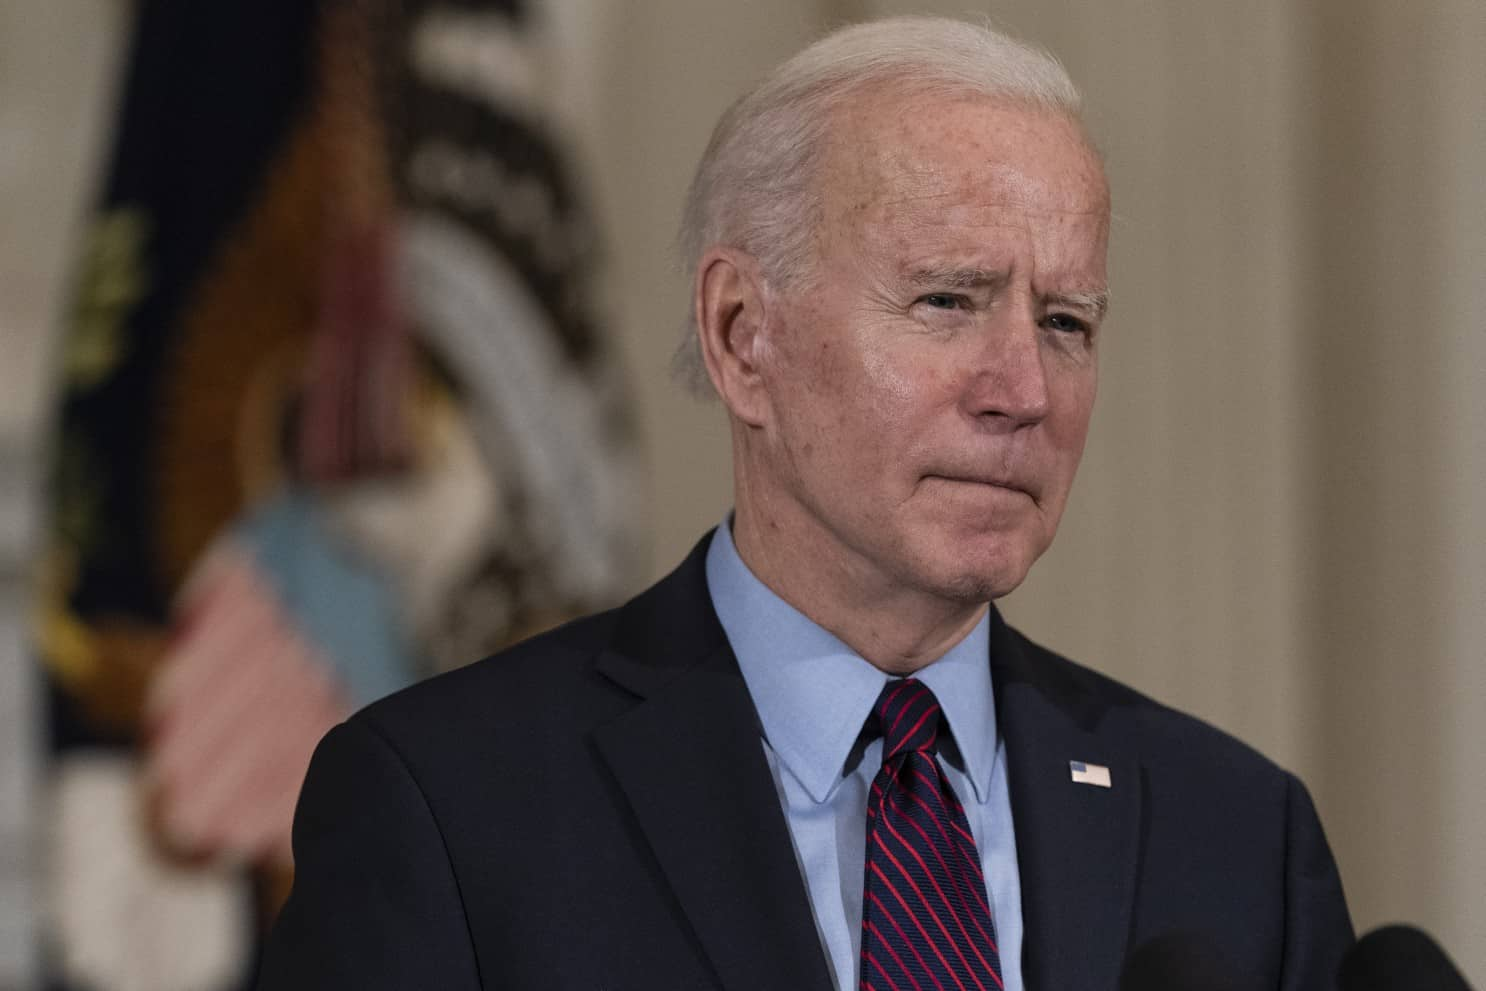 Biden's Opposes Efforts Recalling California Governor Newsom